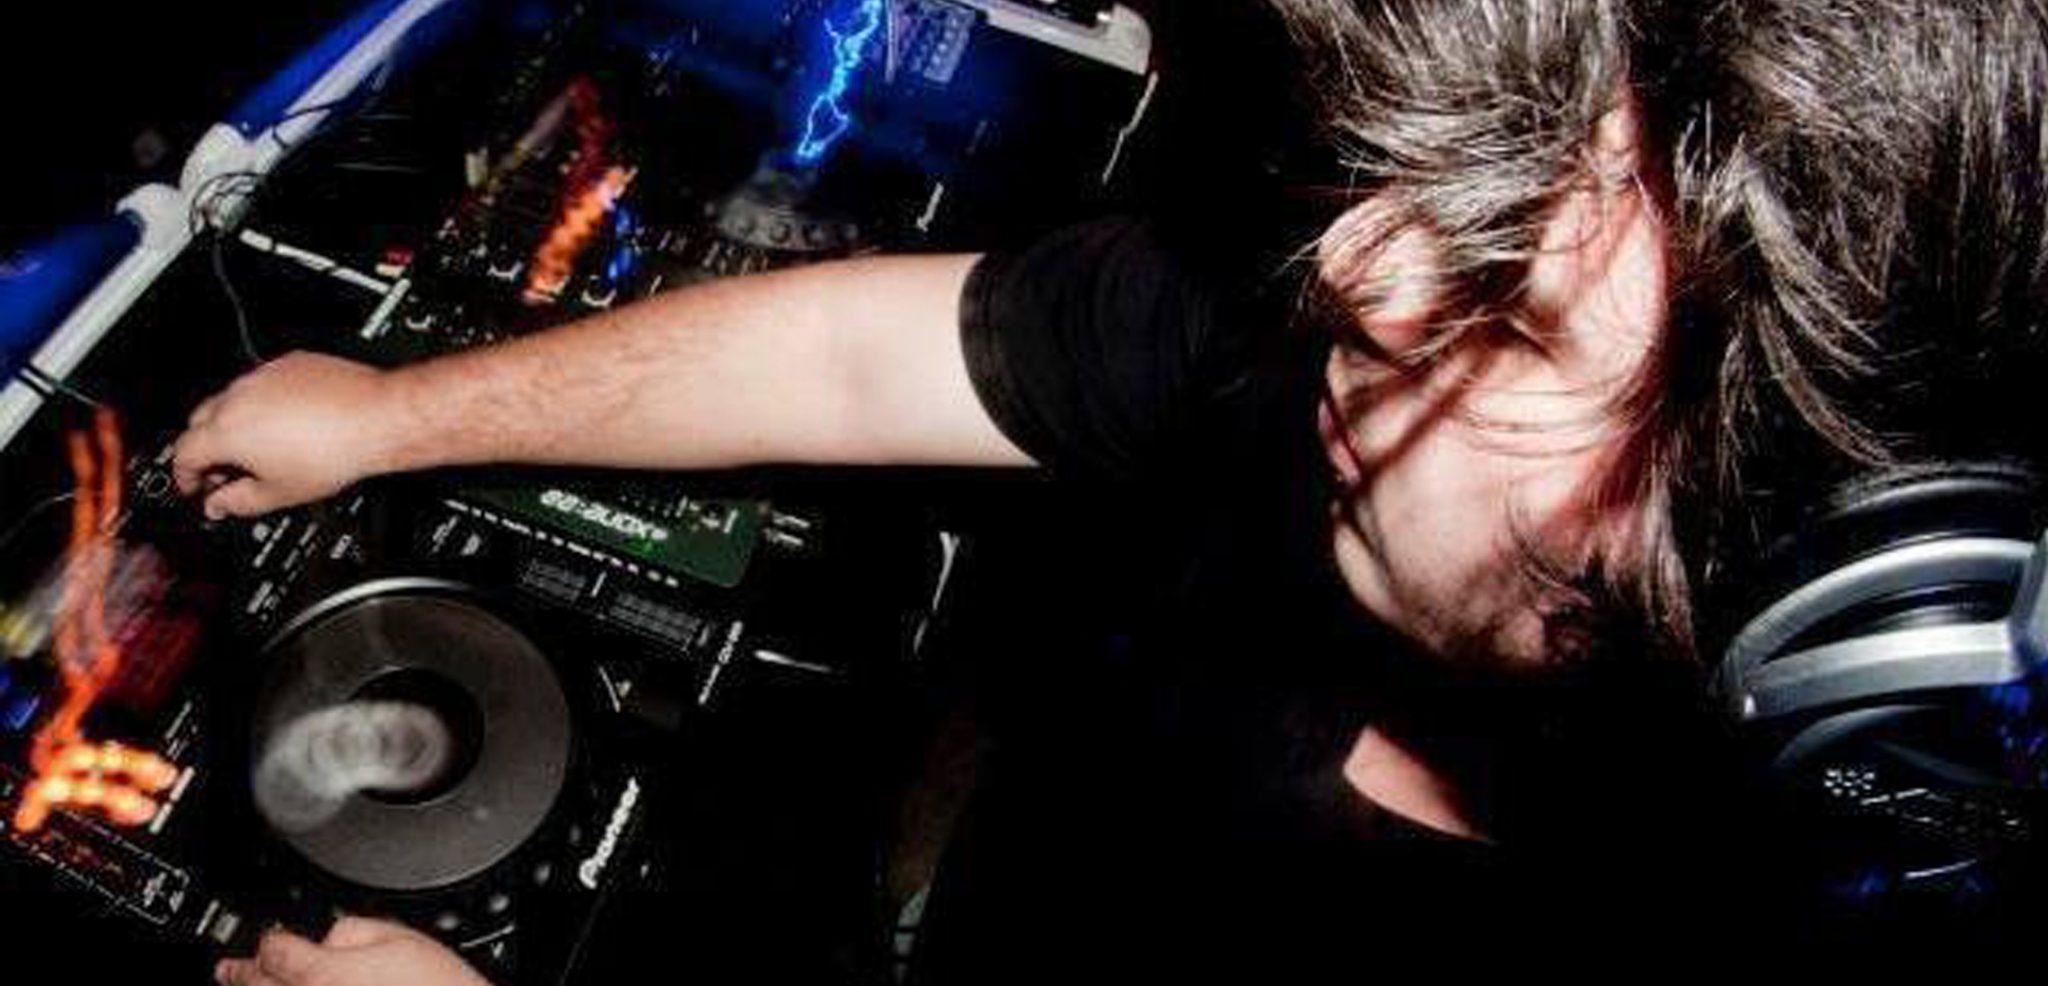 Andre Salmon, Dave Sanz - Black Pudding (incl. Luigi Rocca, Samuele Scelfo & Rulers Remix) hero